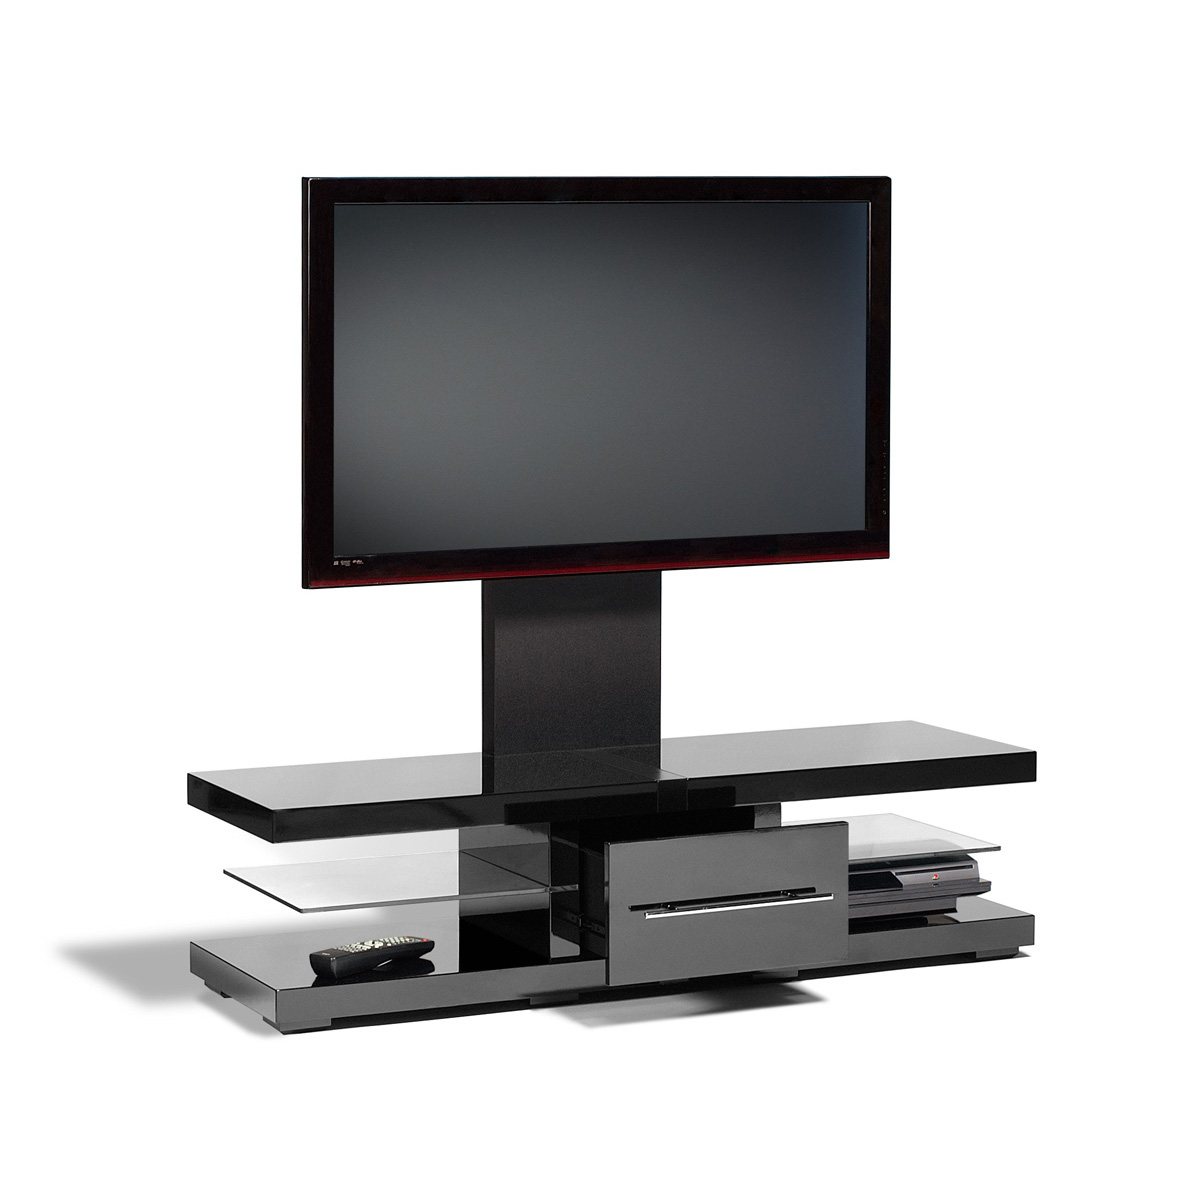 Black Metallic Flat Screen Tv Stand Mount 42 60 Inch